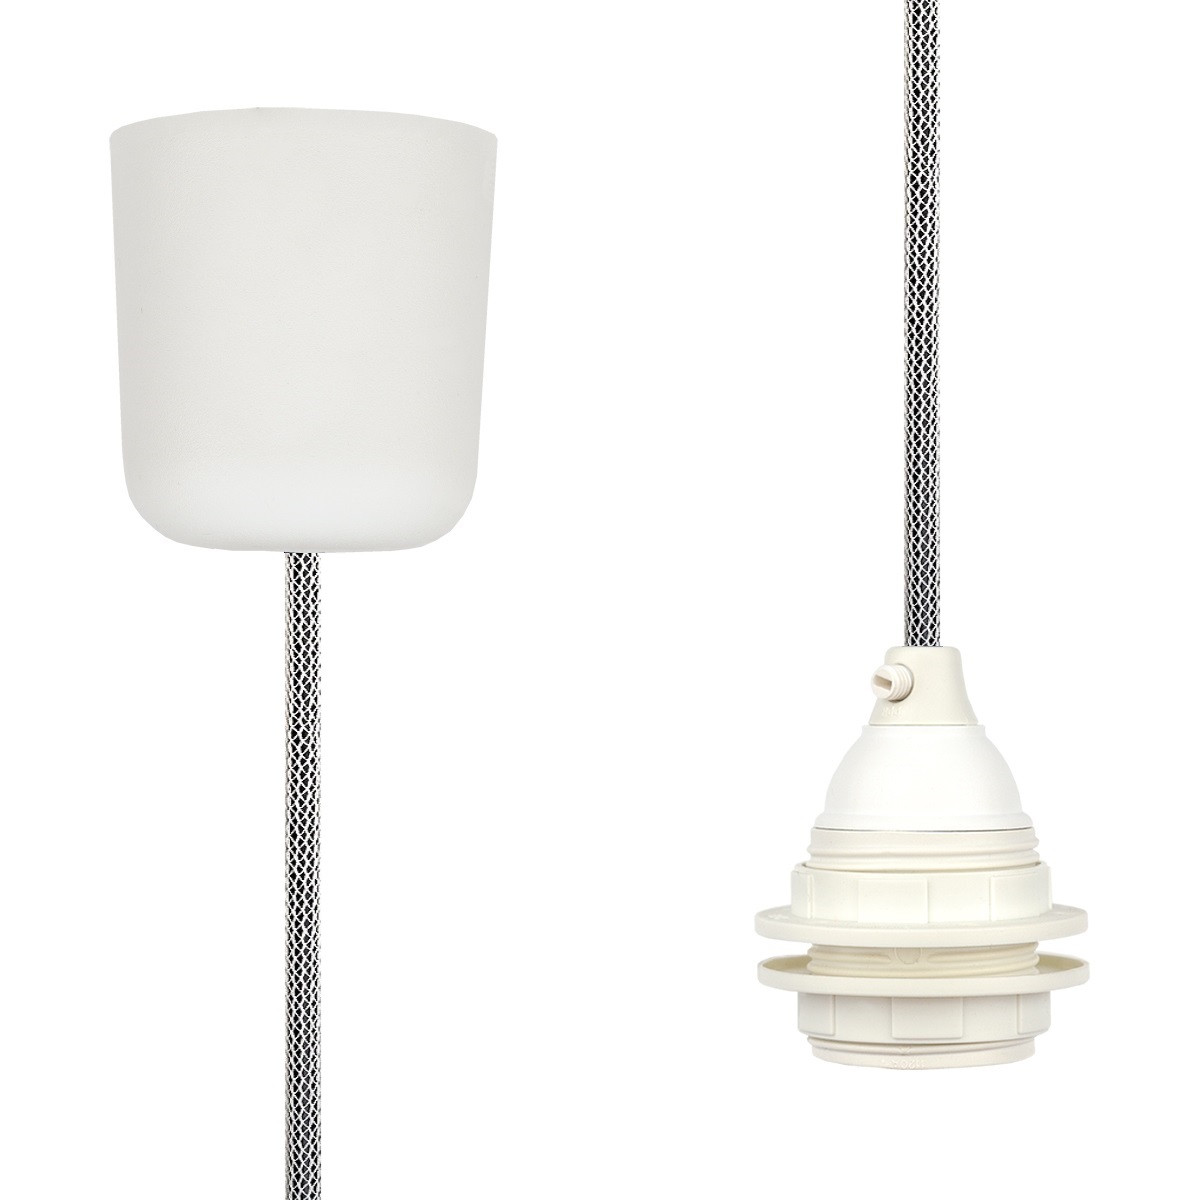 Pendant Lamp Plastic Off White-Black Netlike